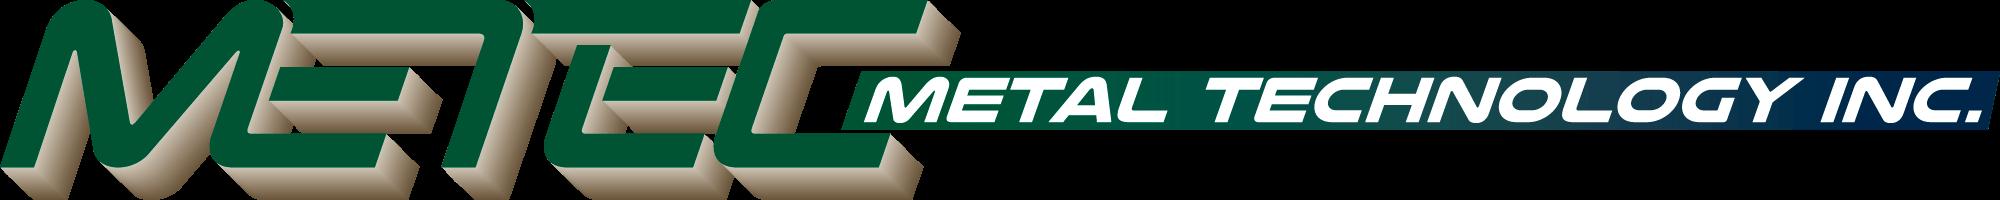 METEC Metal Technology Inc.